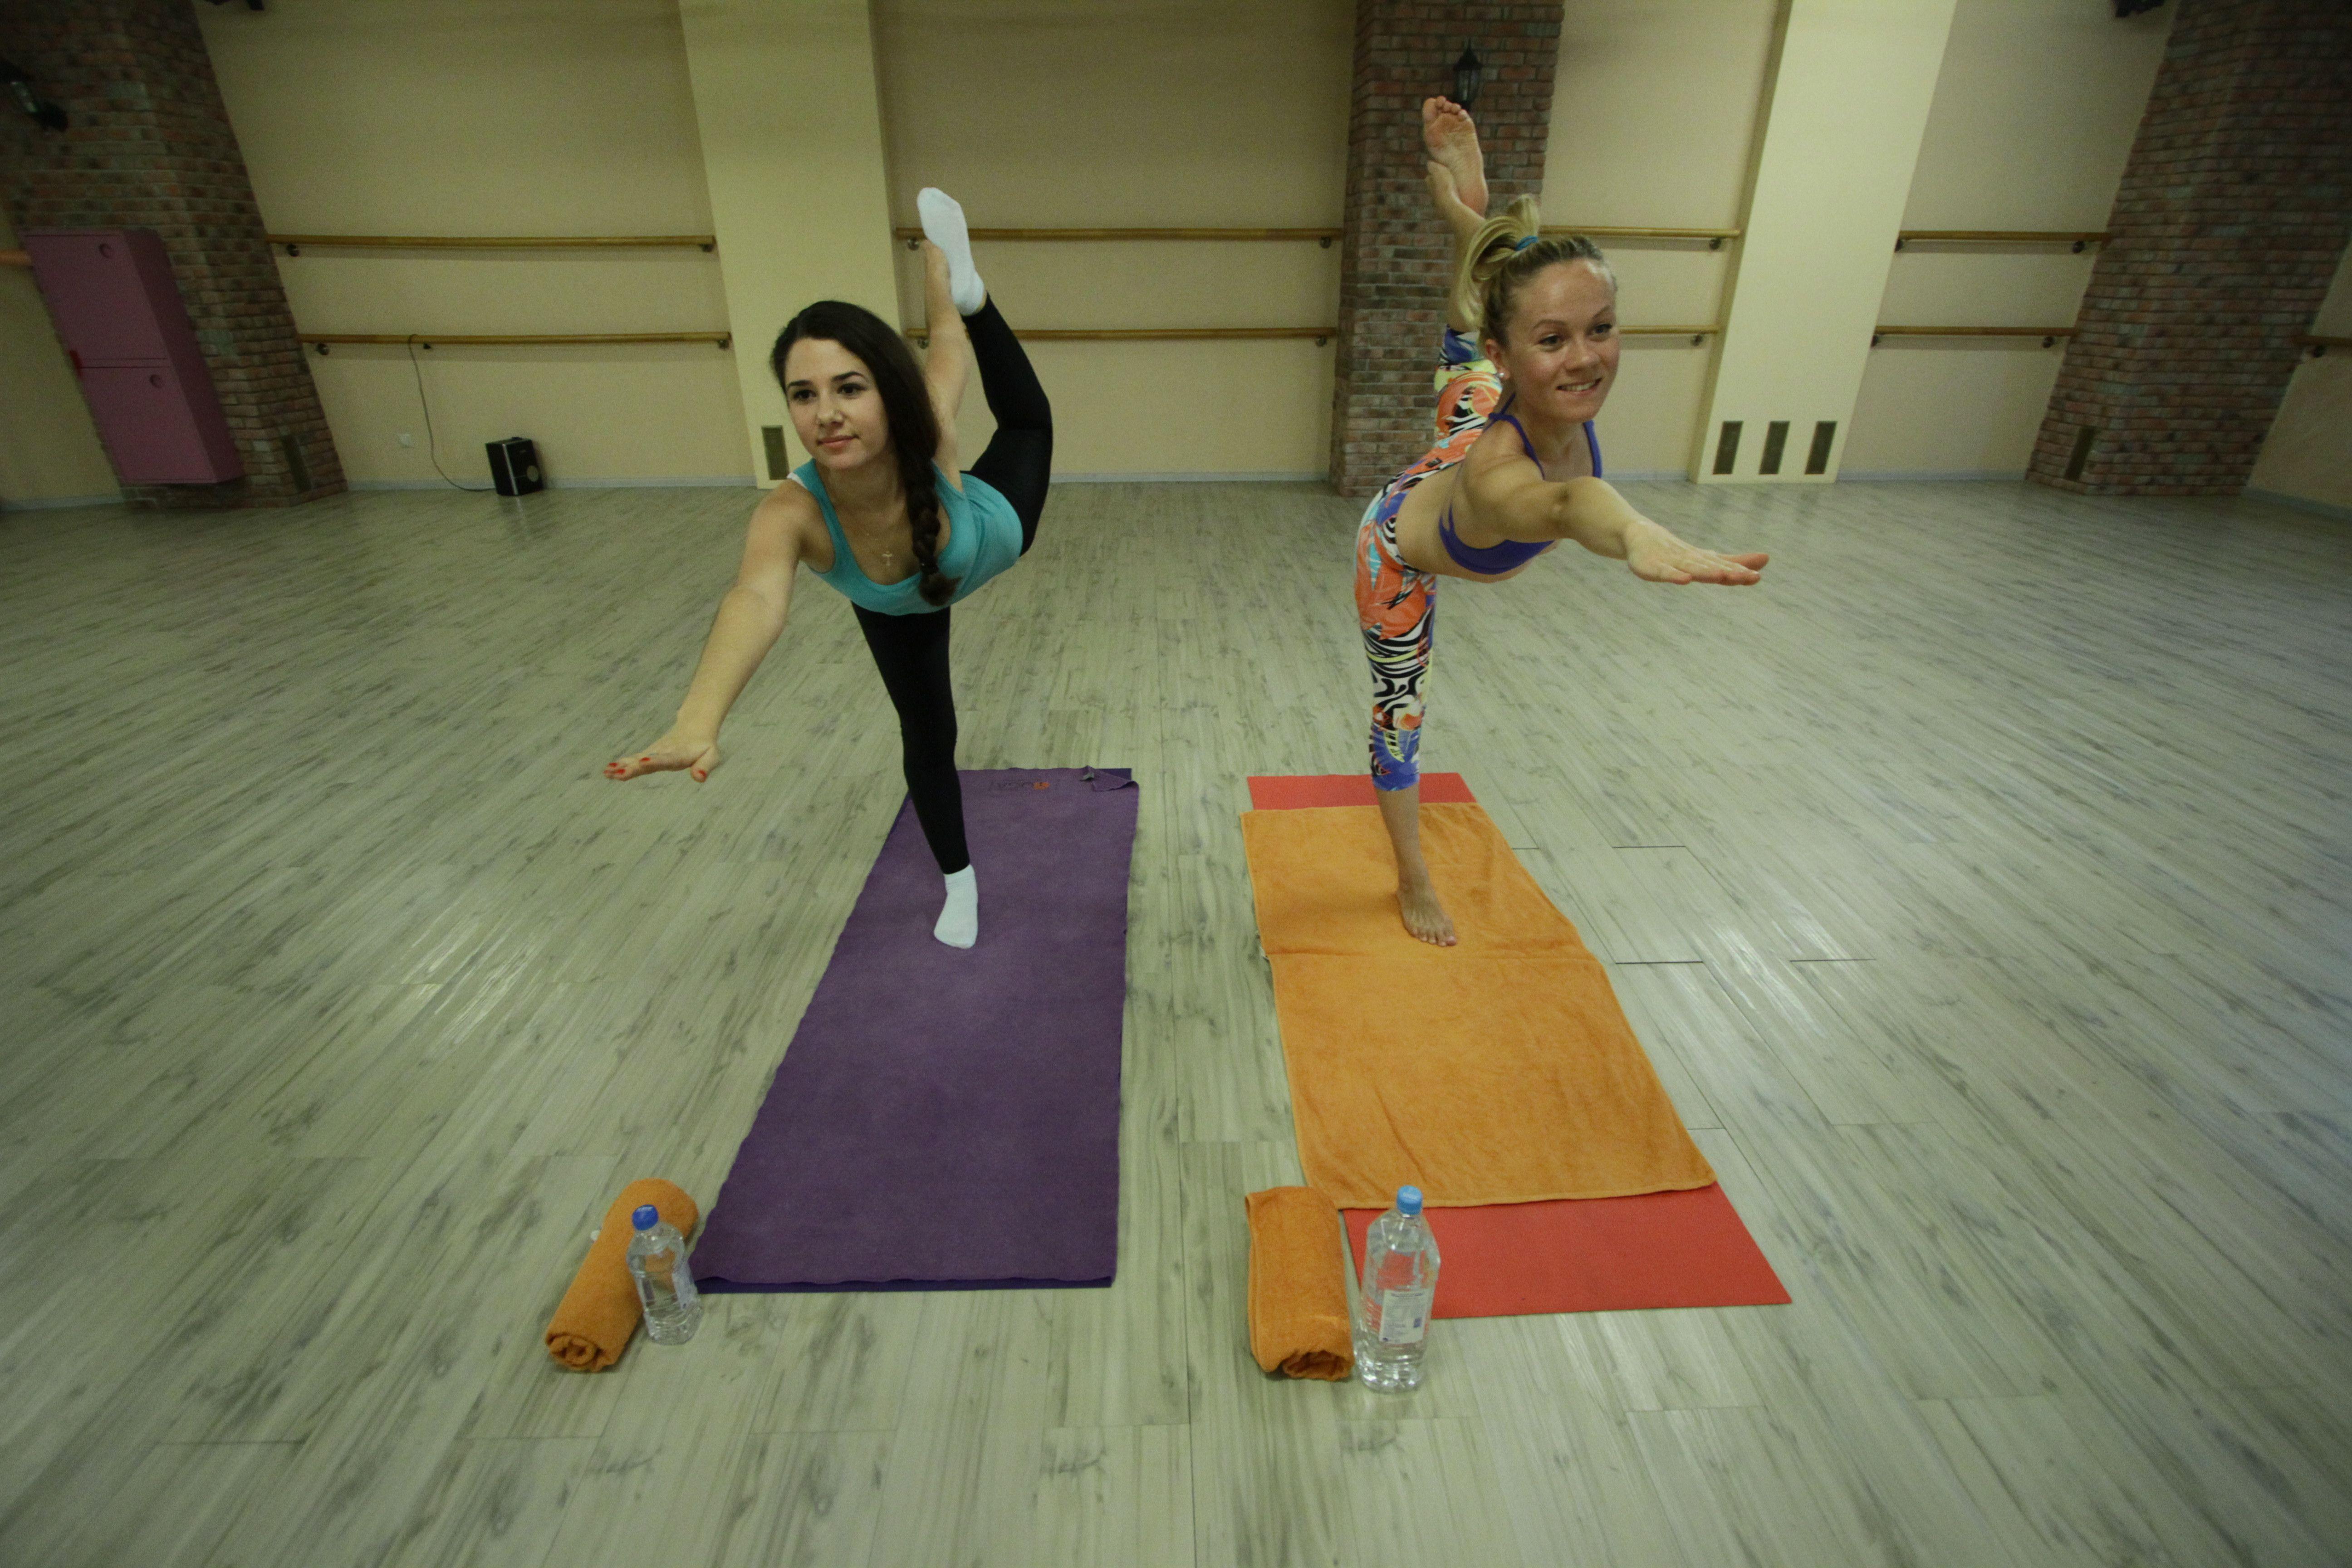 Московские парки пригласили на онлайн-занятия по рисованию и йоге